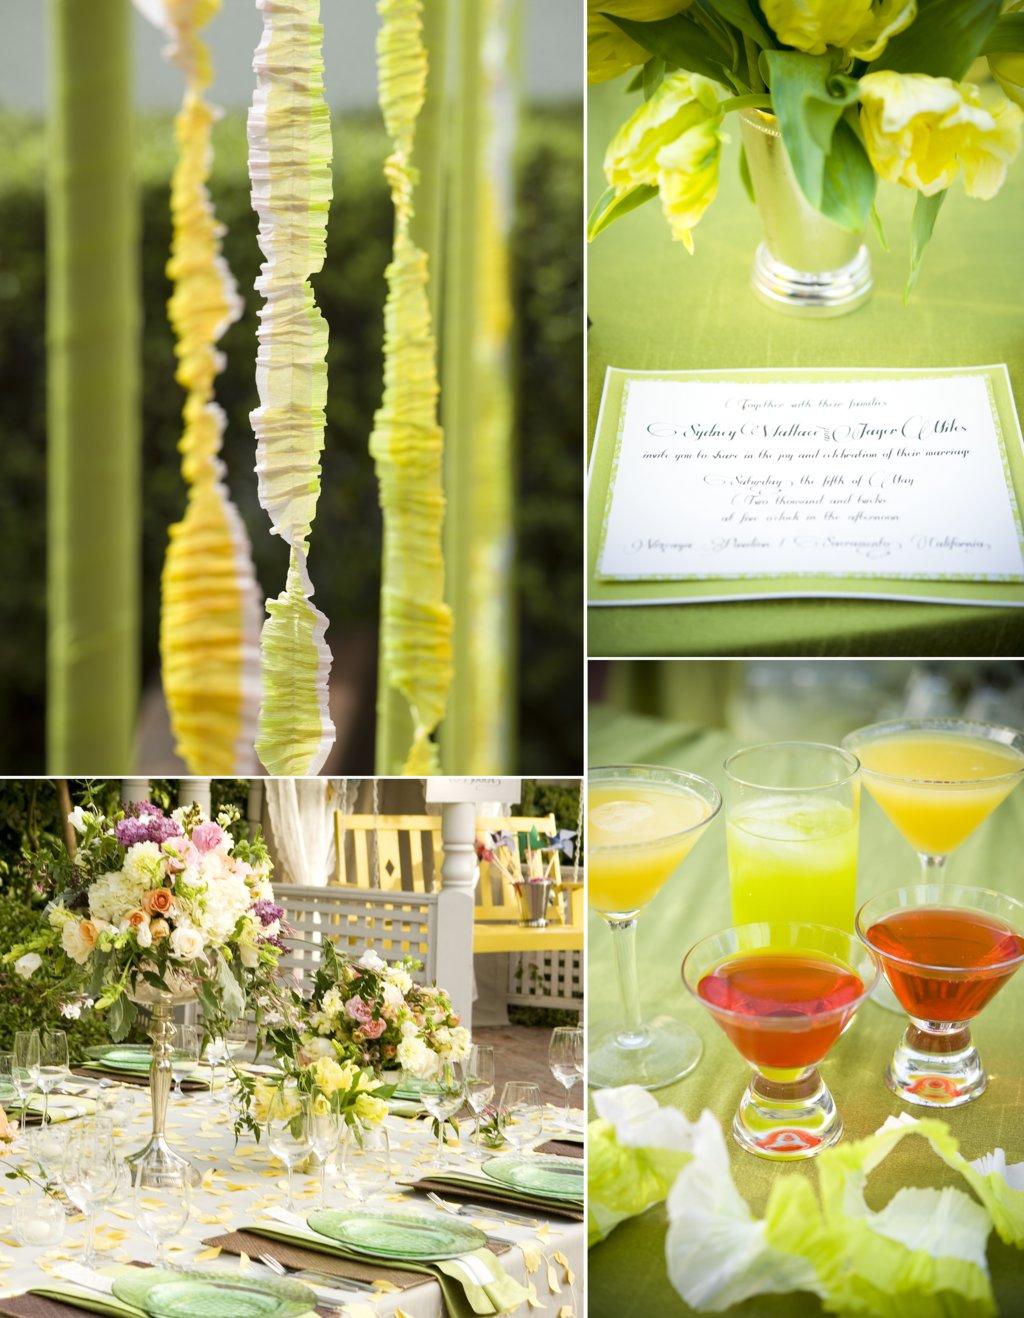 Whimsical-garden-wedding-green-yellow-romantic-pastel-wedding-flowers.full